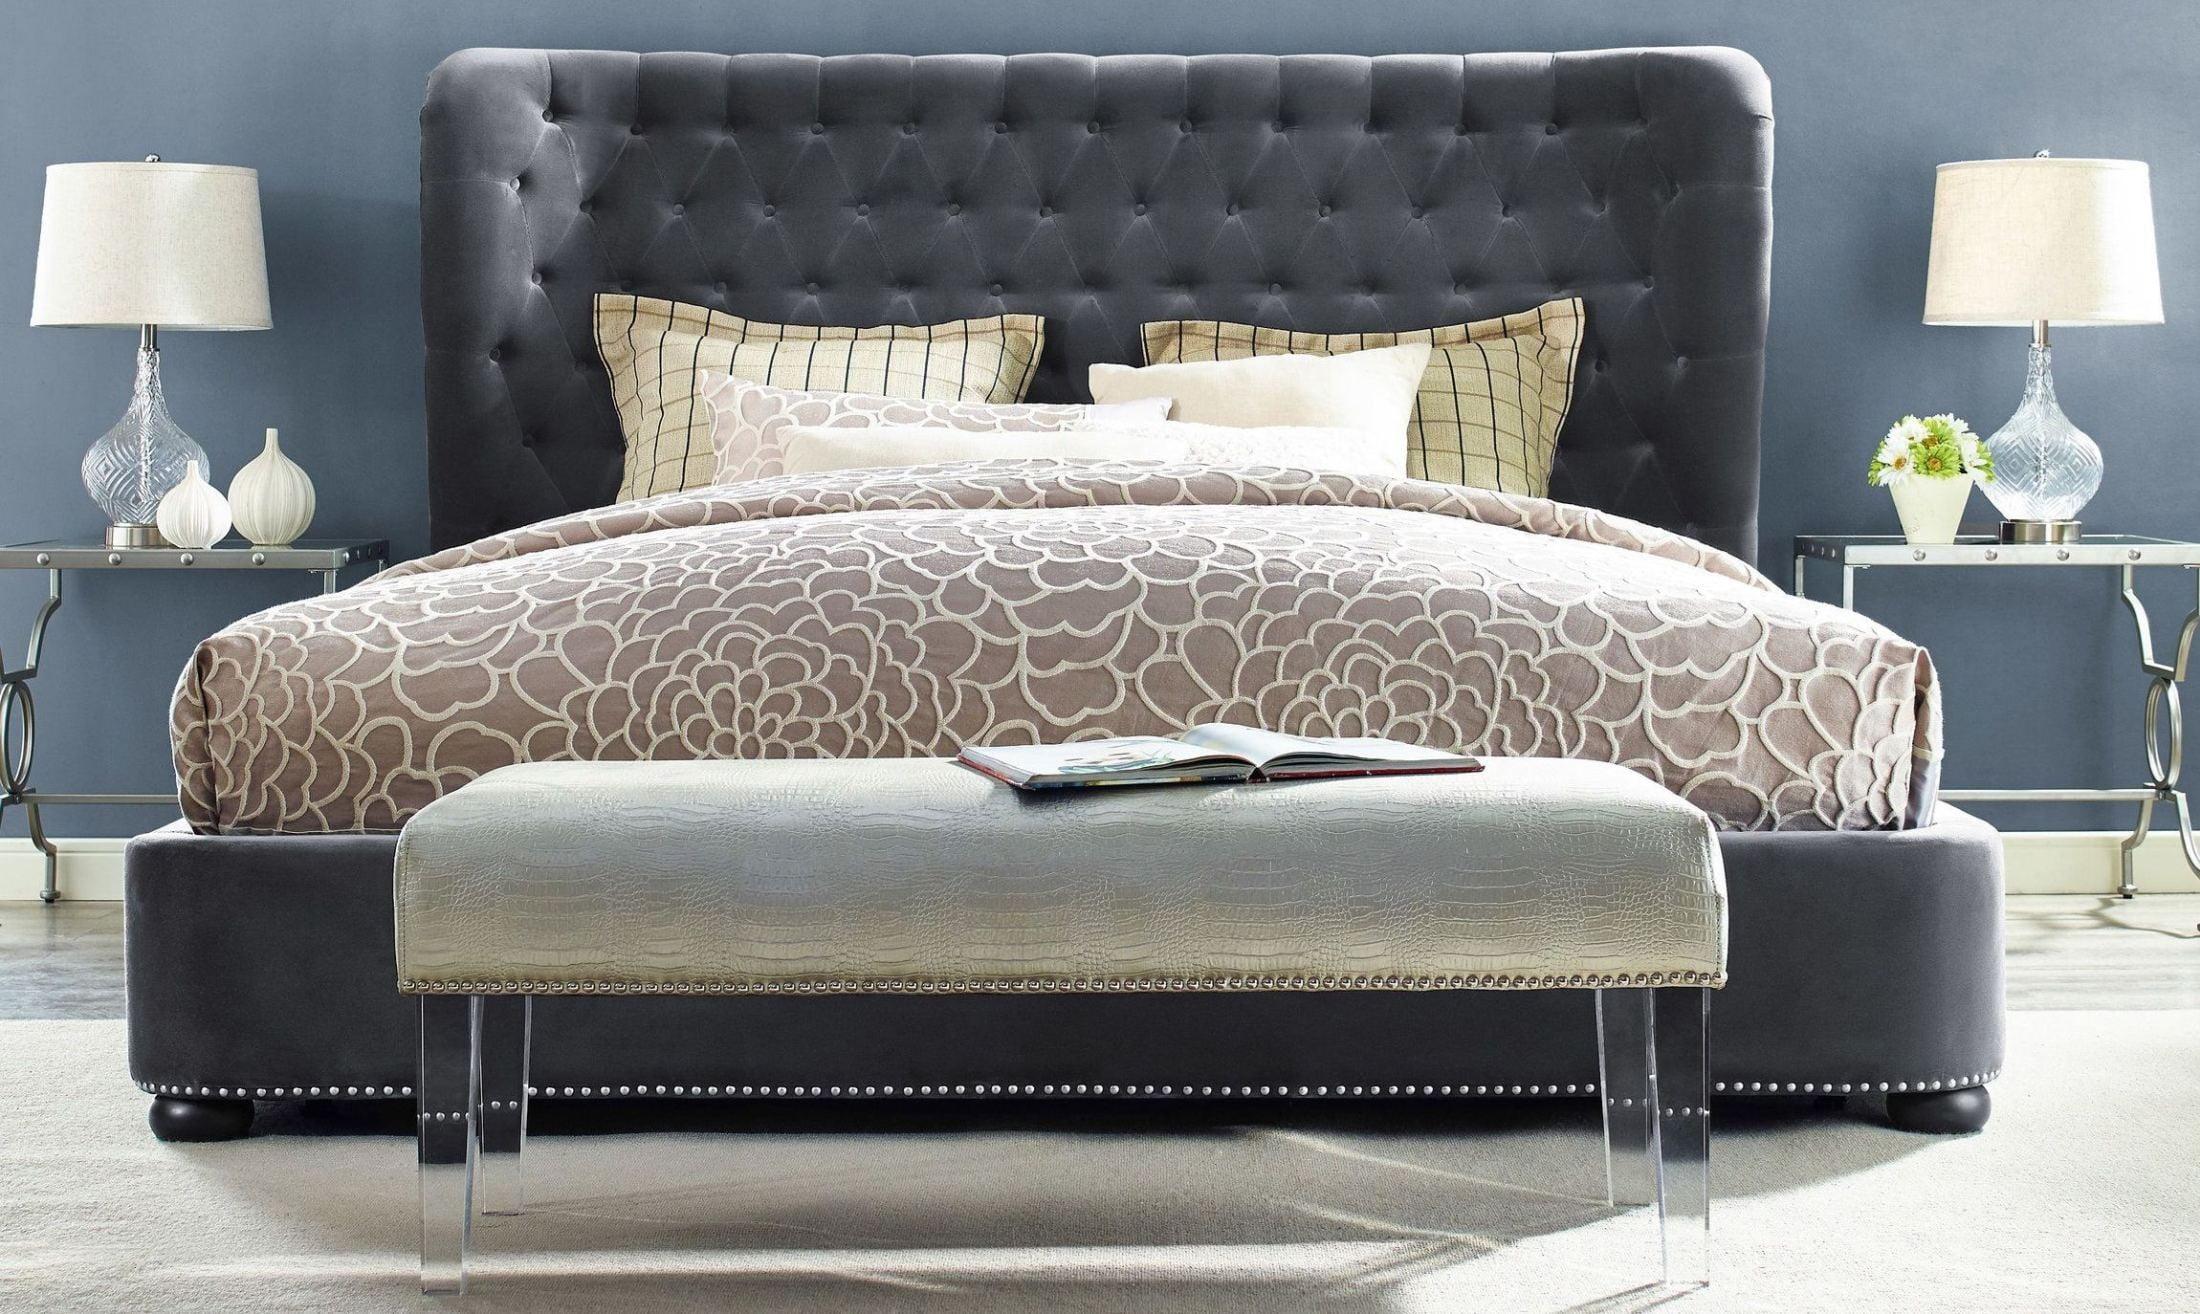 Tov Furniture Finley Grey Velvet Queen Bed